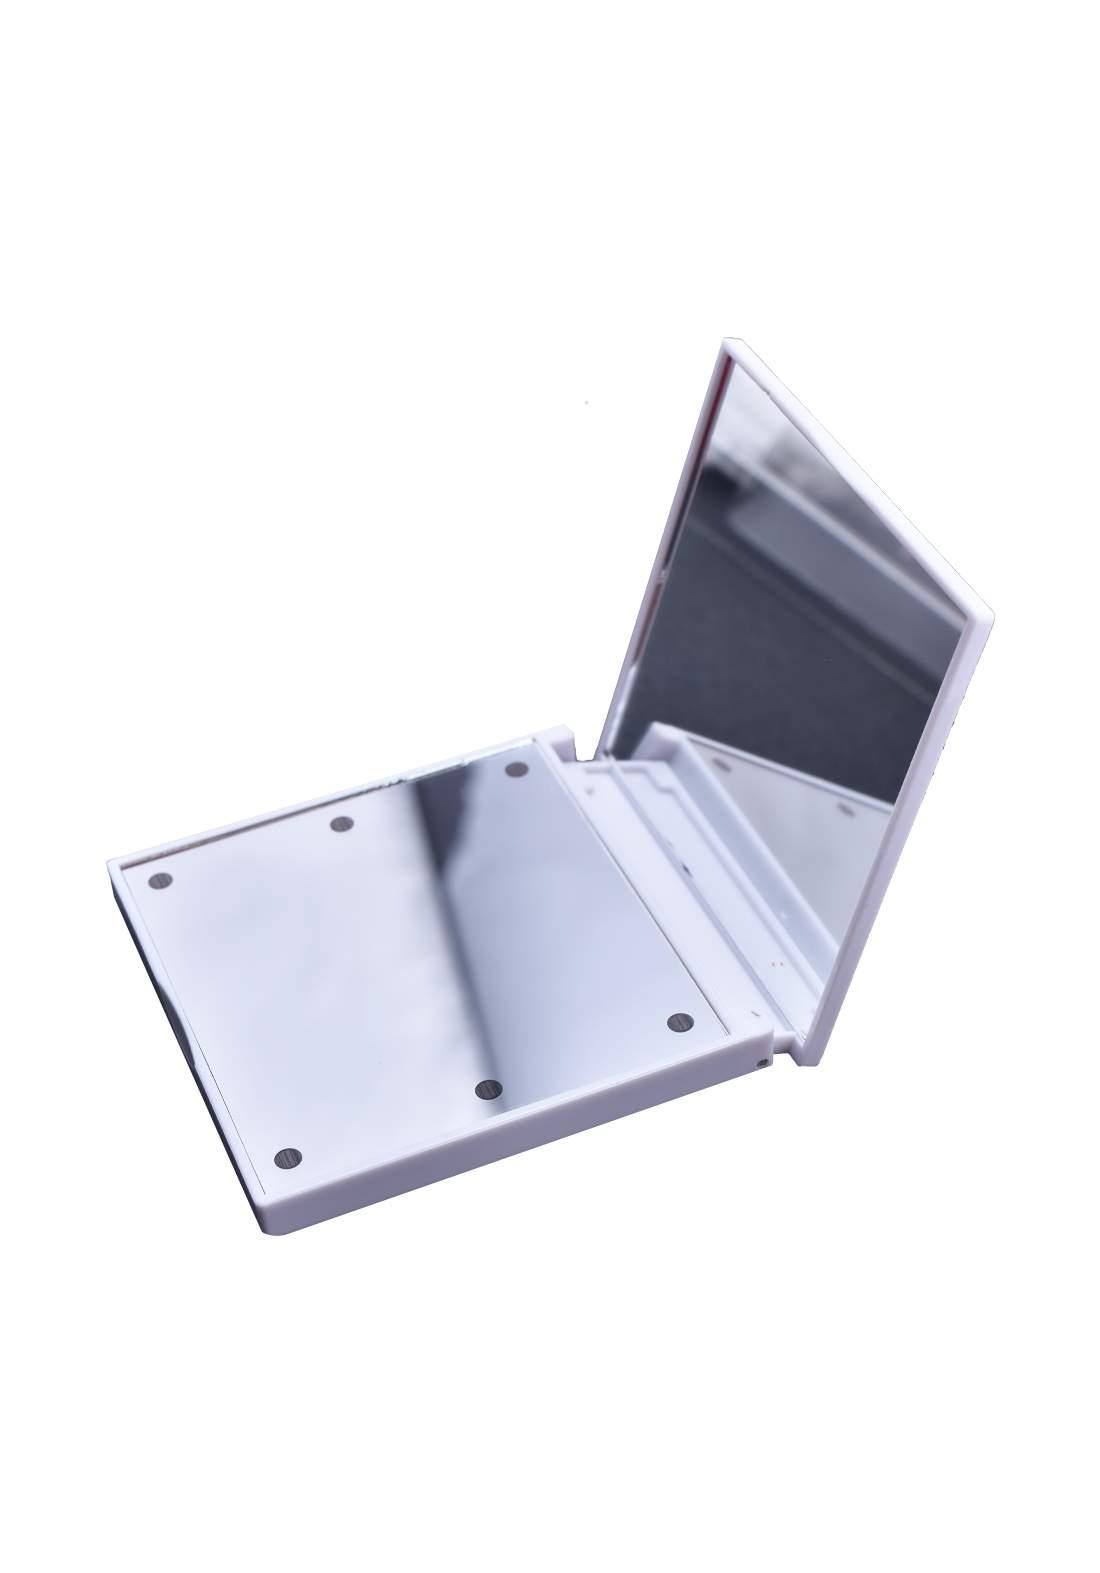 Folding Cosmetic Mirror  With Led مرآة مربعة الشكل مع انارة ضوئية